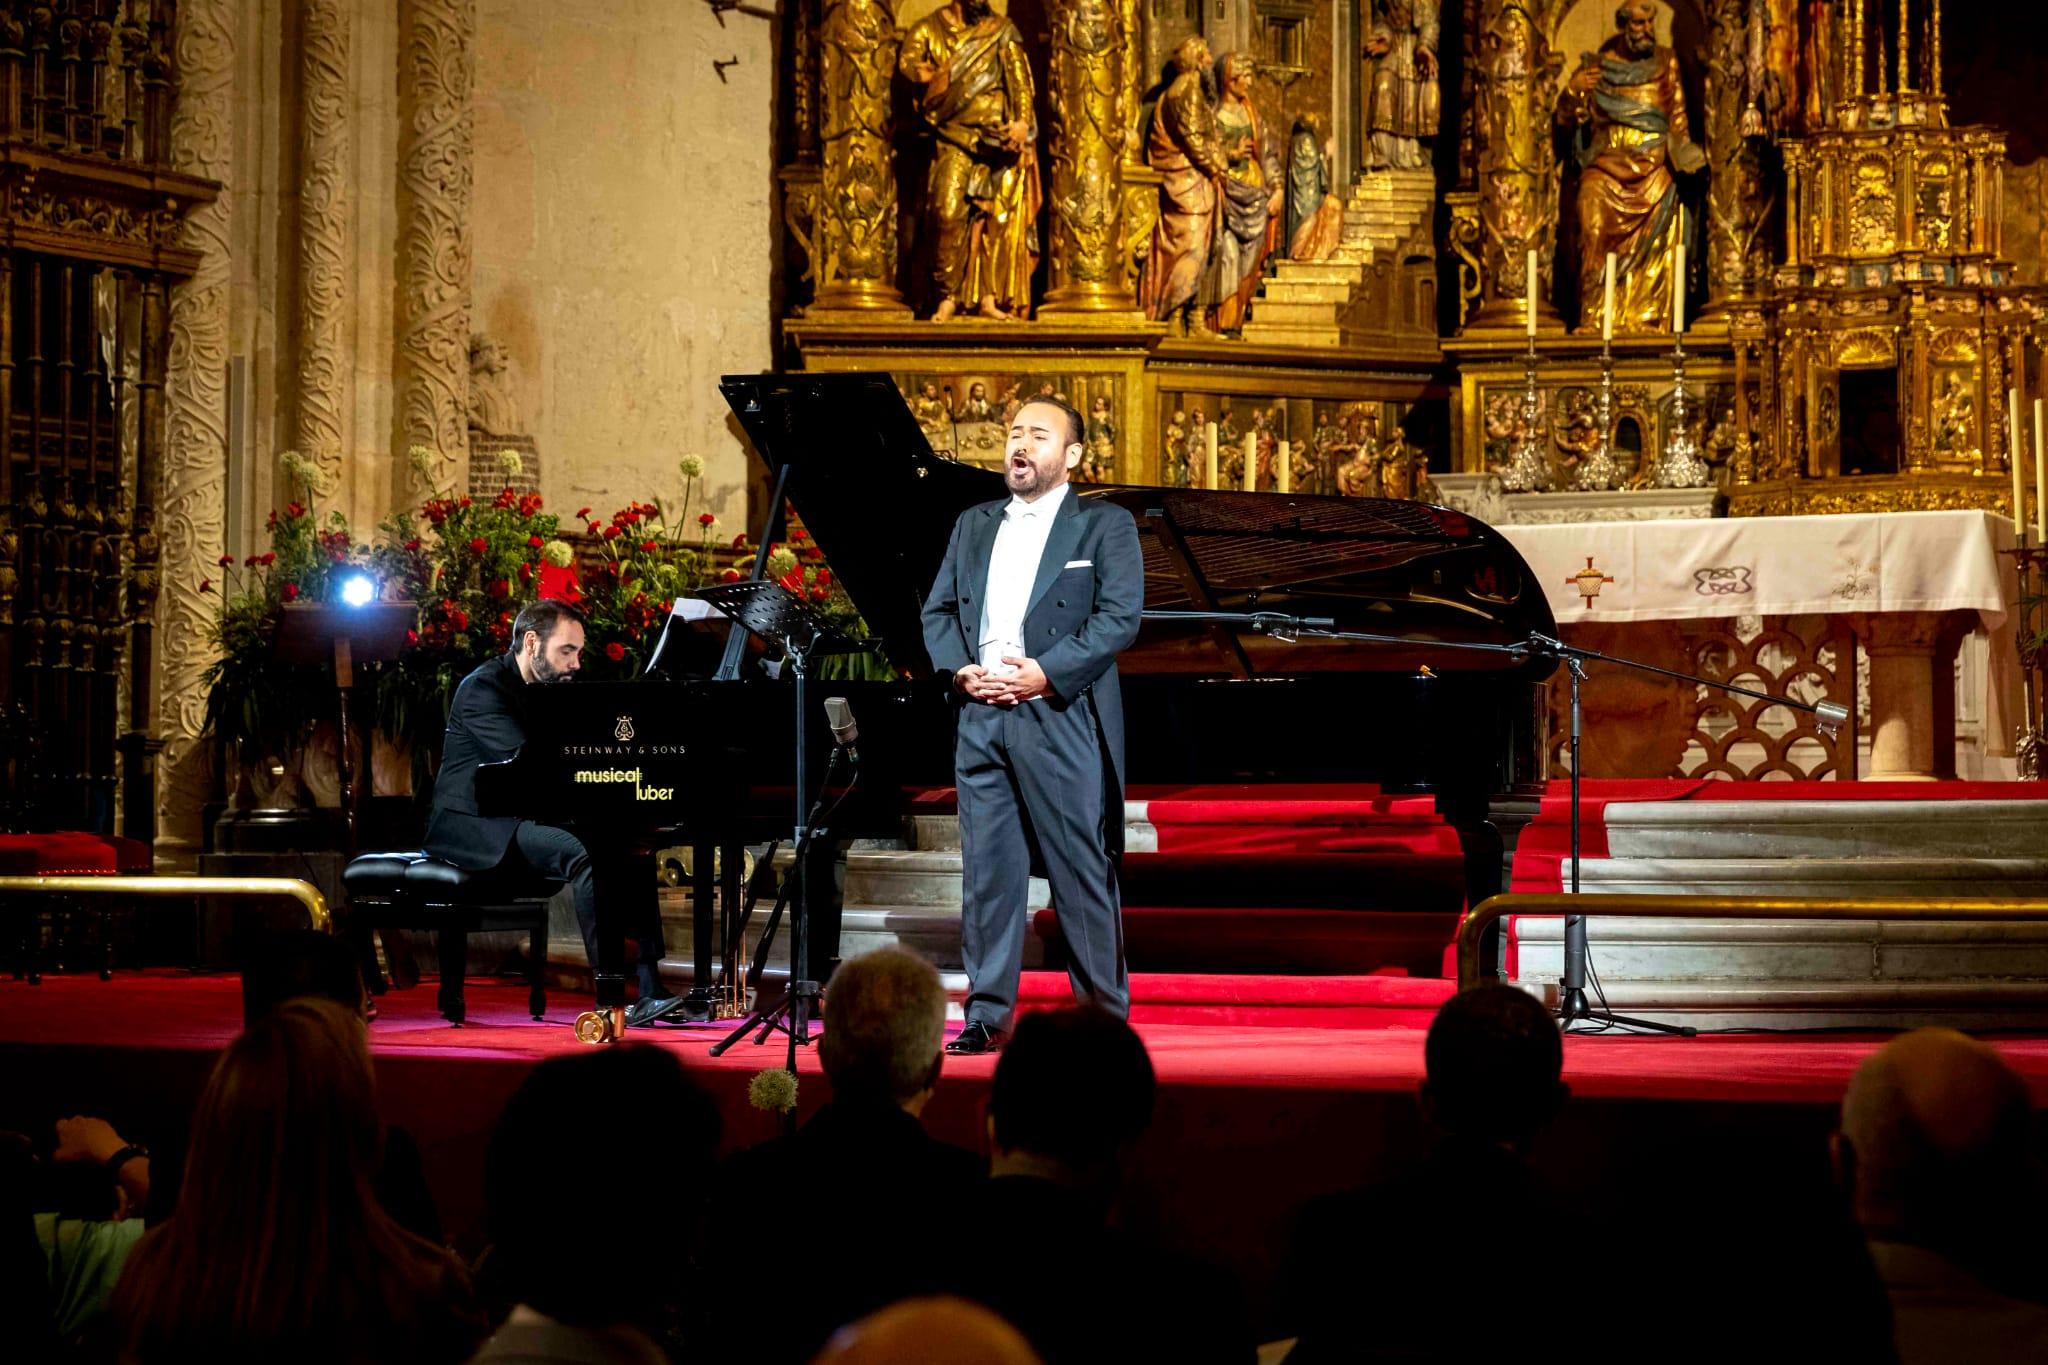 recital-camarena-catedral-burgos